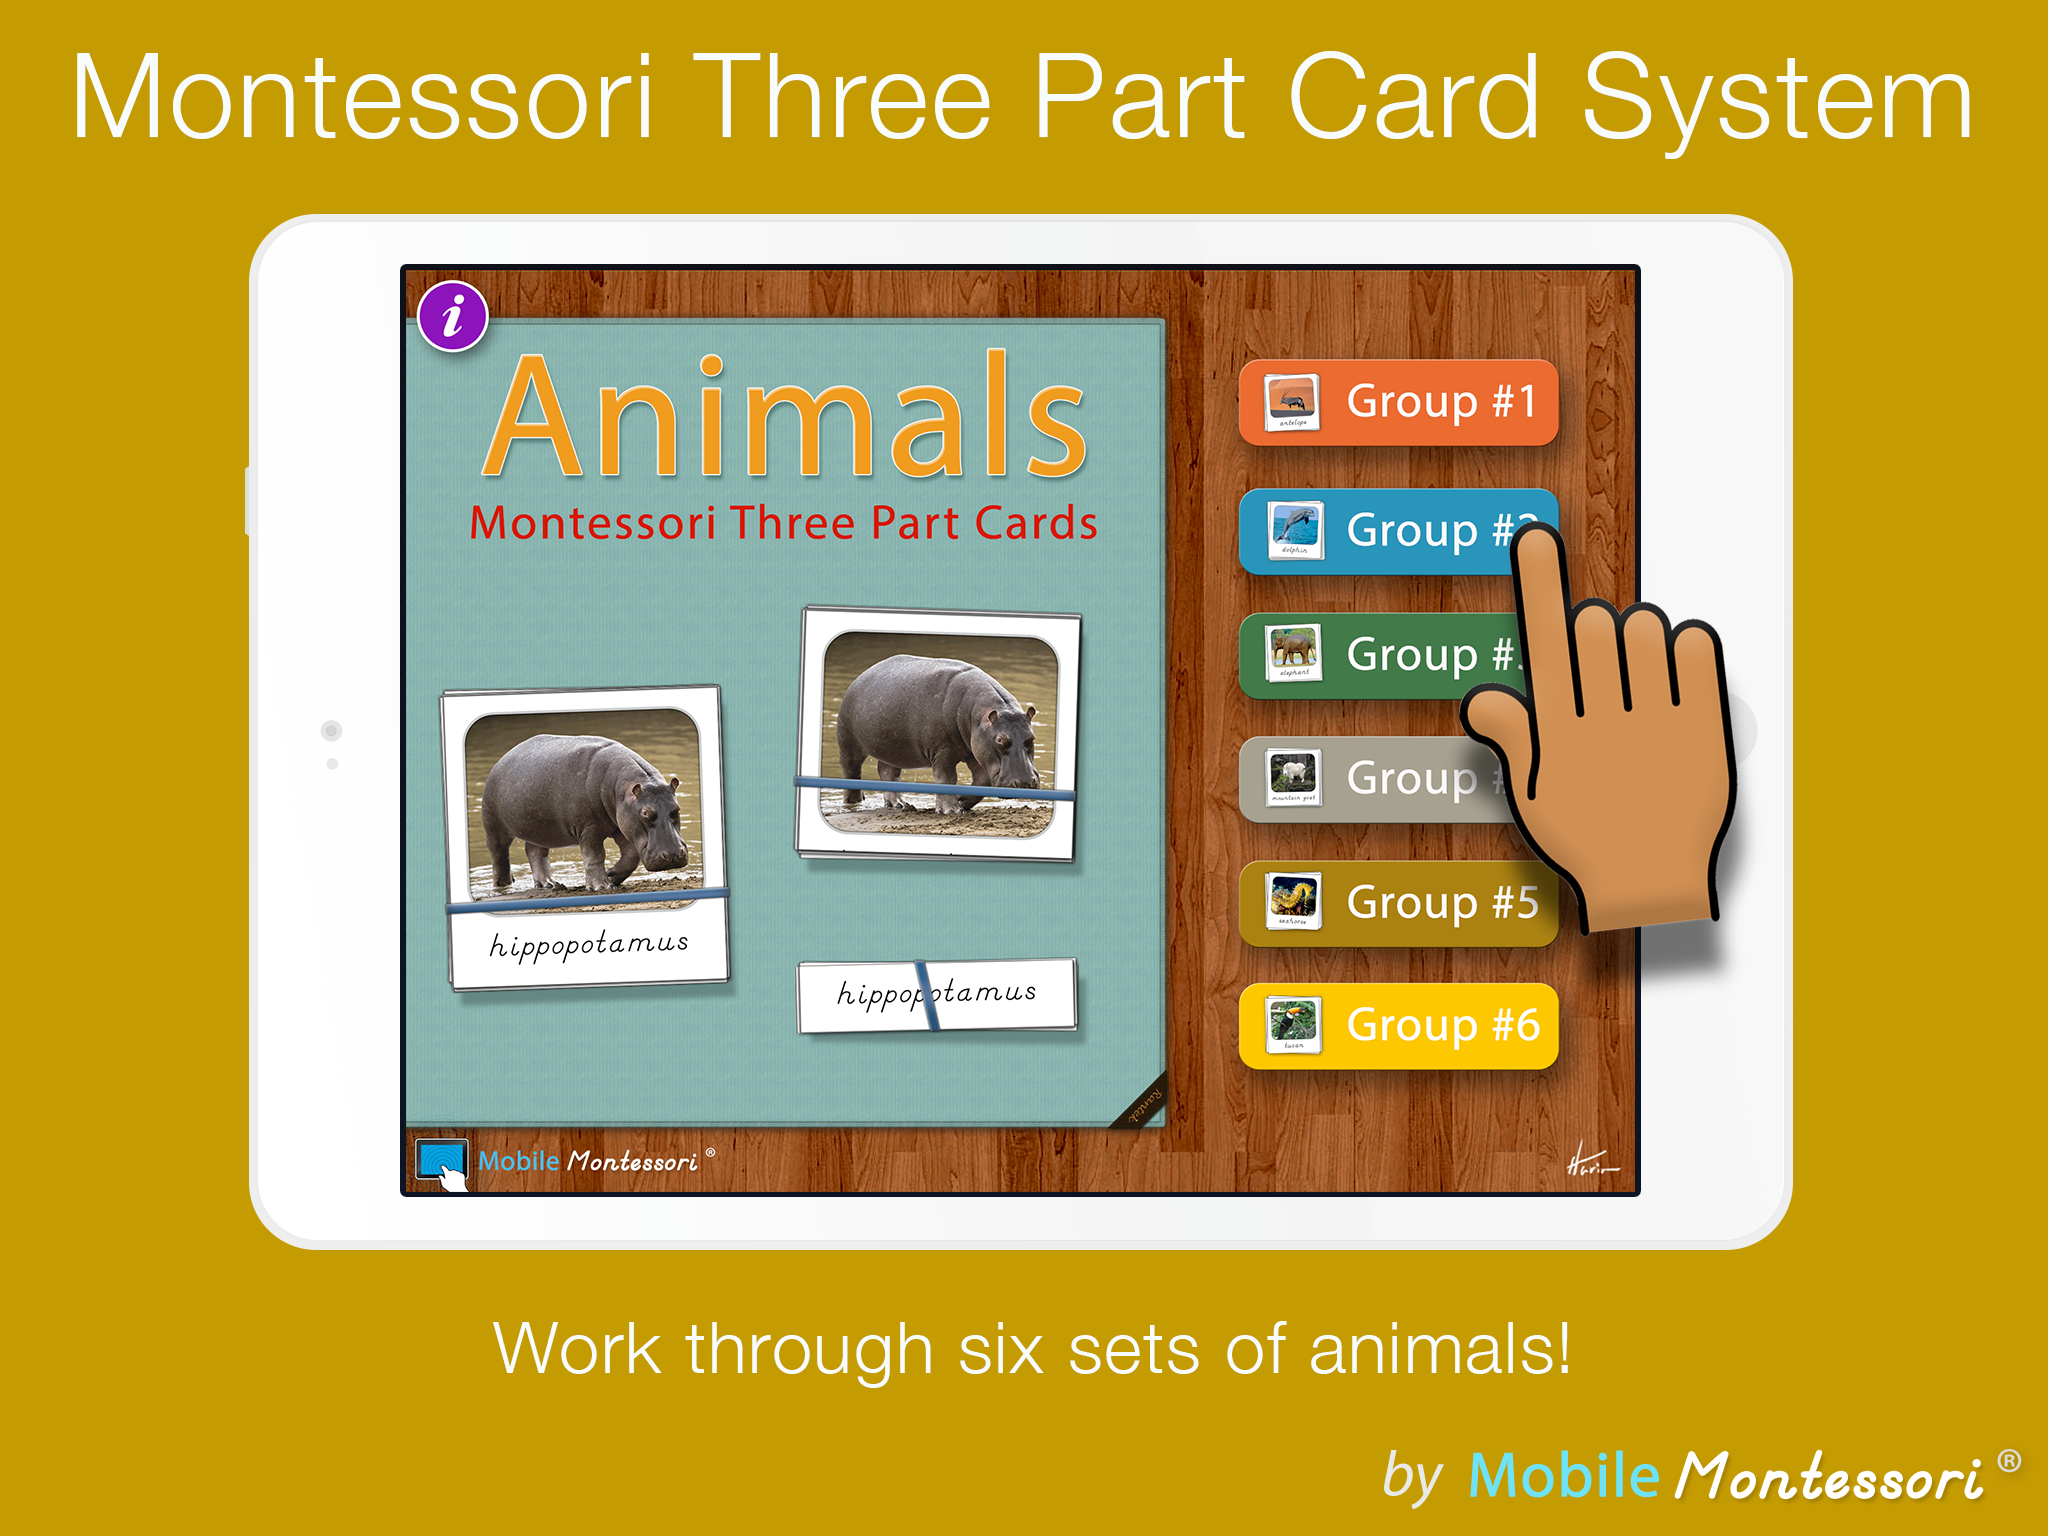 AnimalsSC5-reg.png